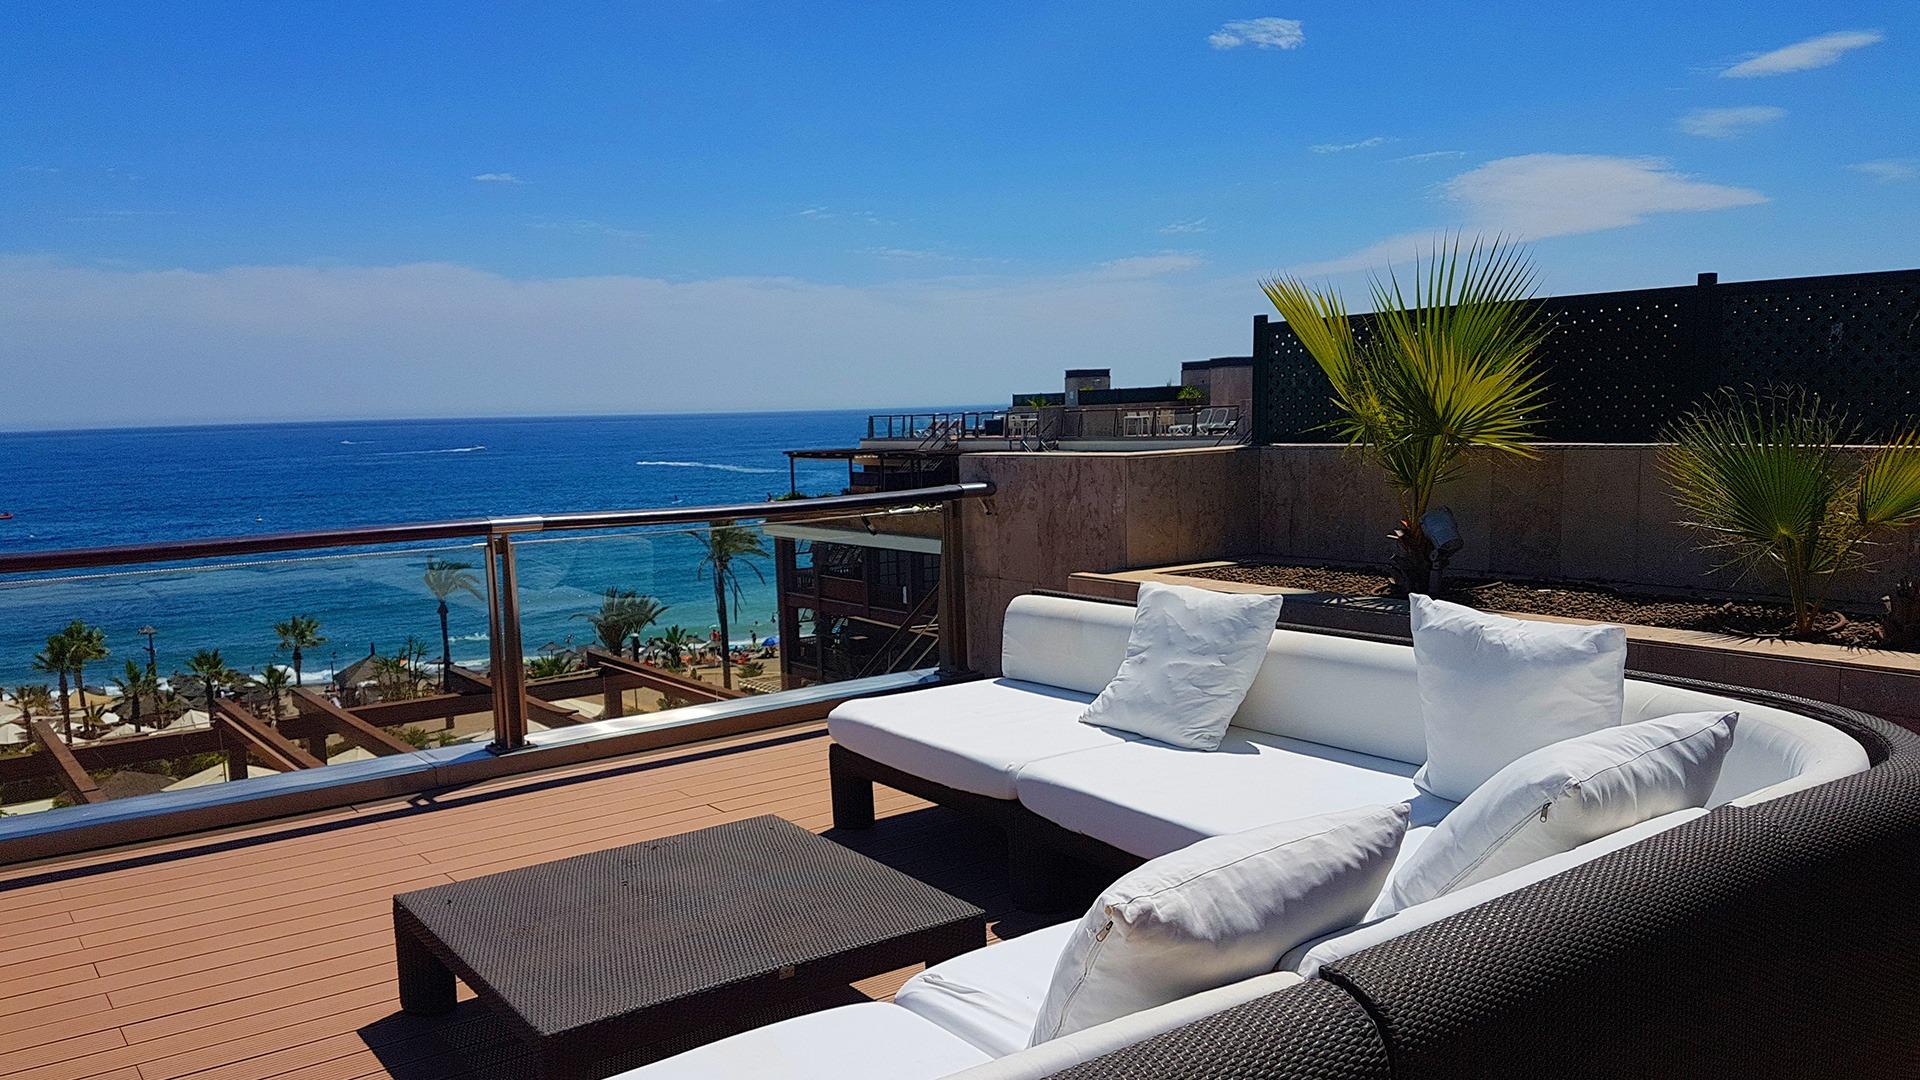 Long Beach Hotel Room Rent